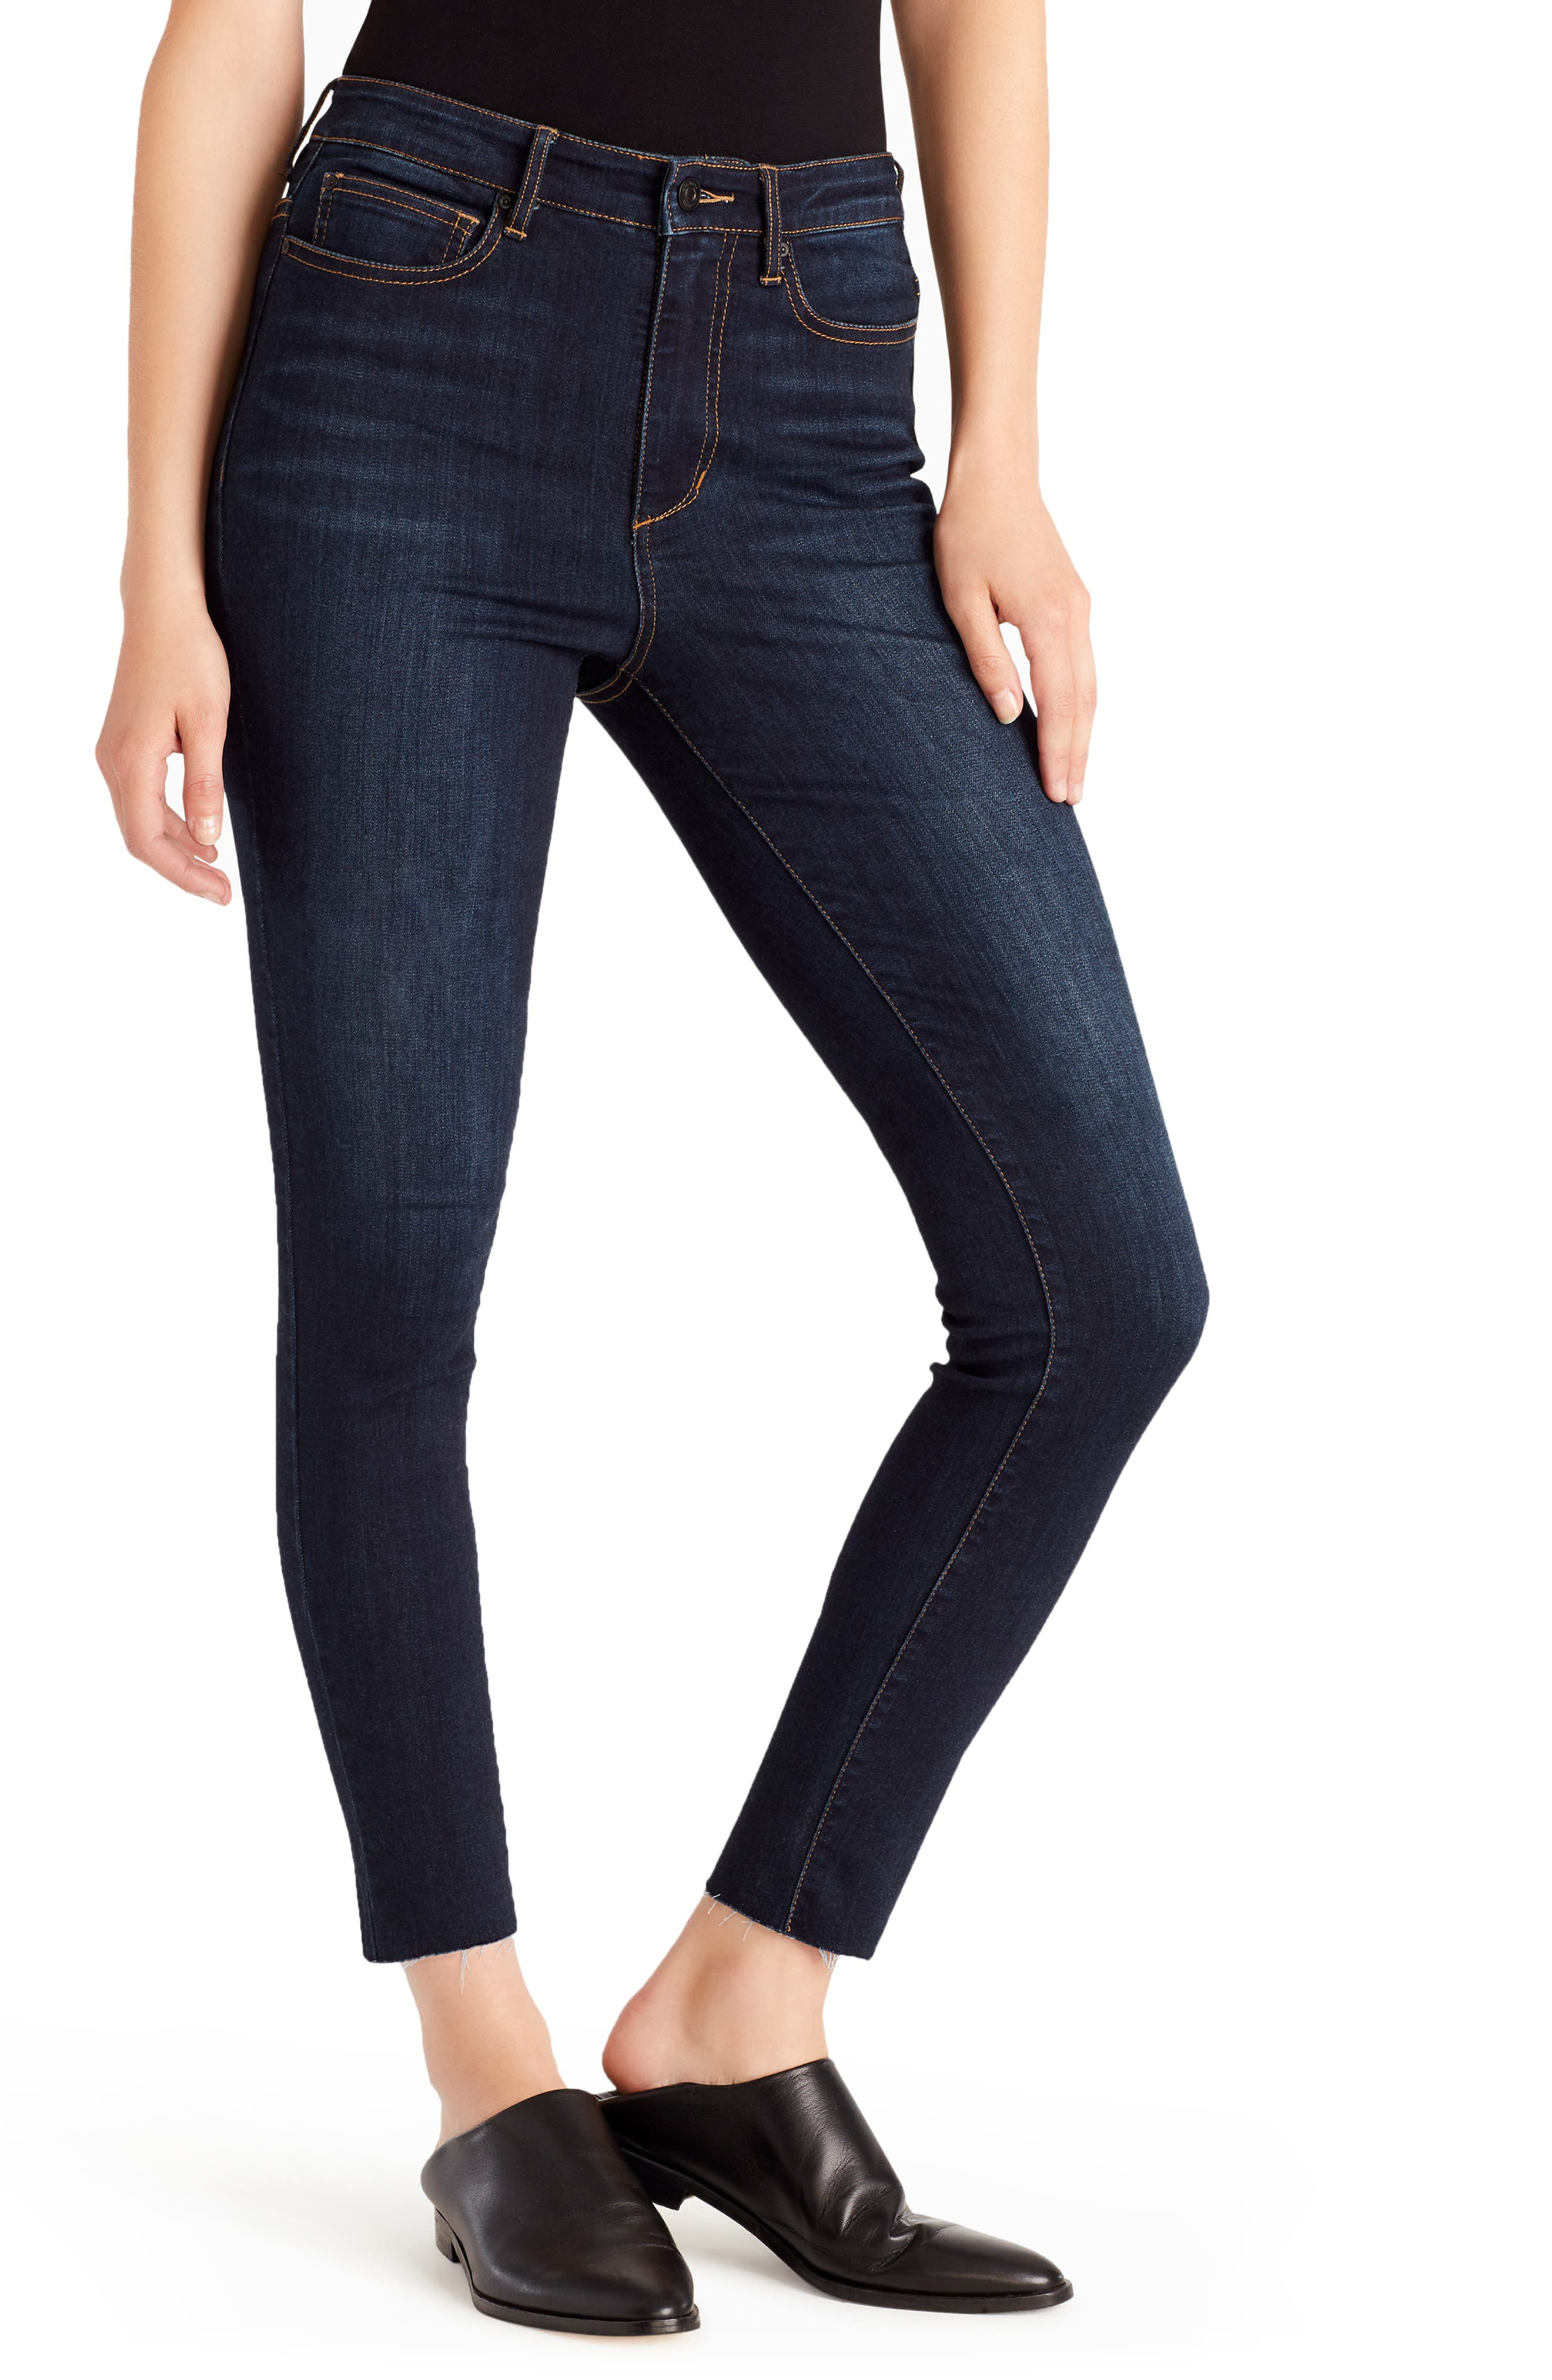 Ella Moss Jeans High Waist Ankle Skinny Jeans